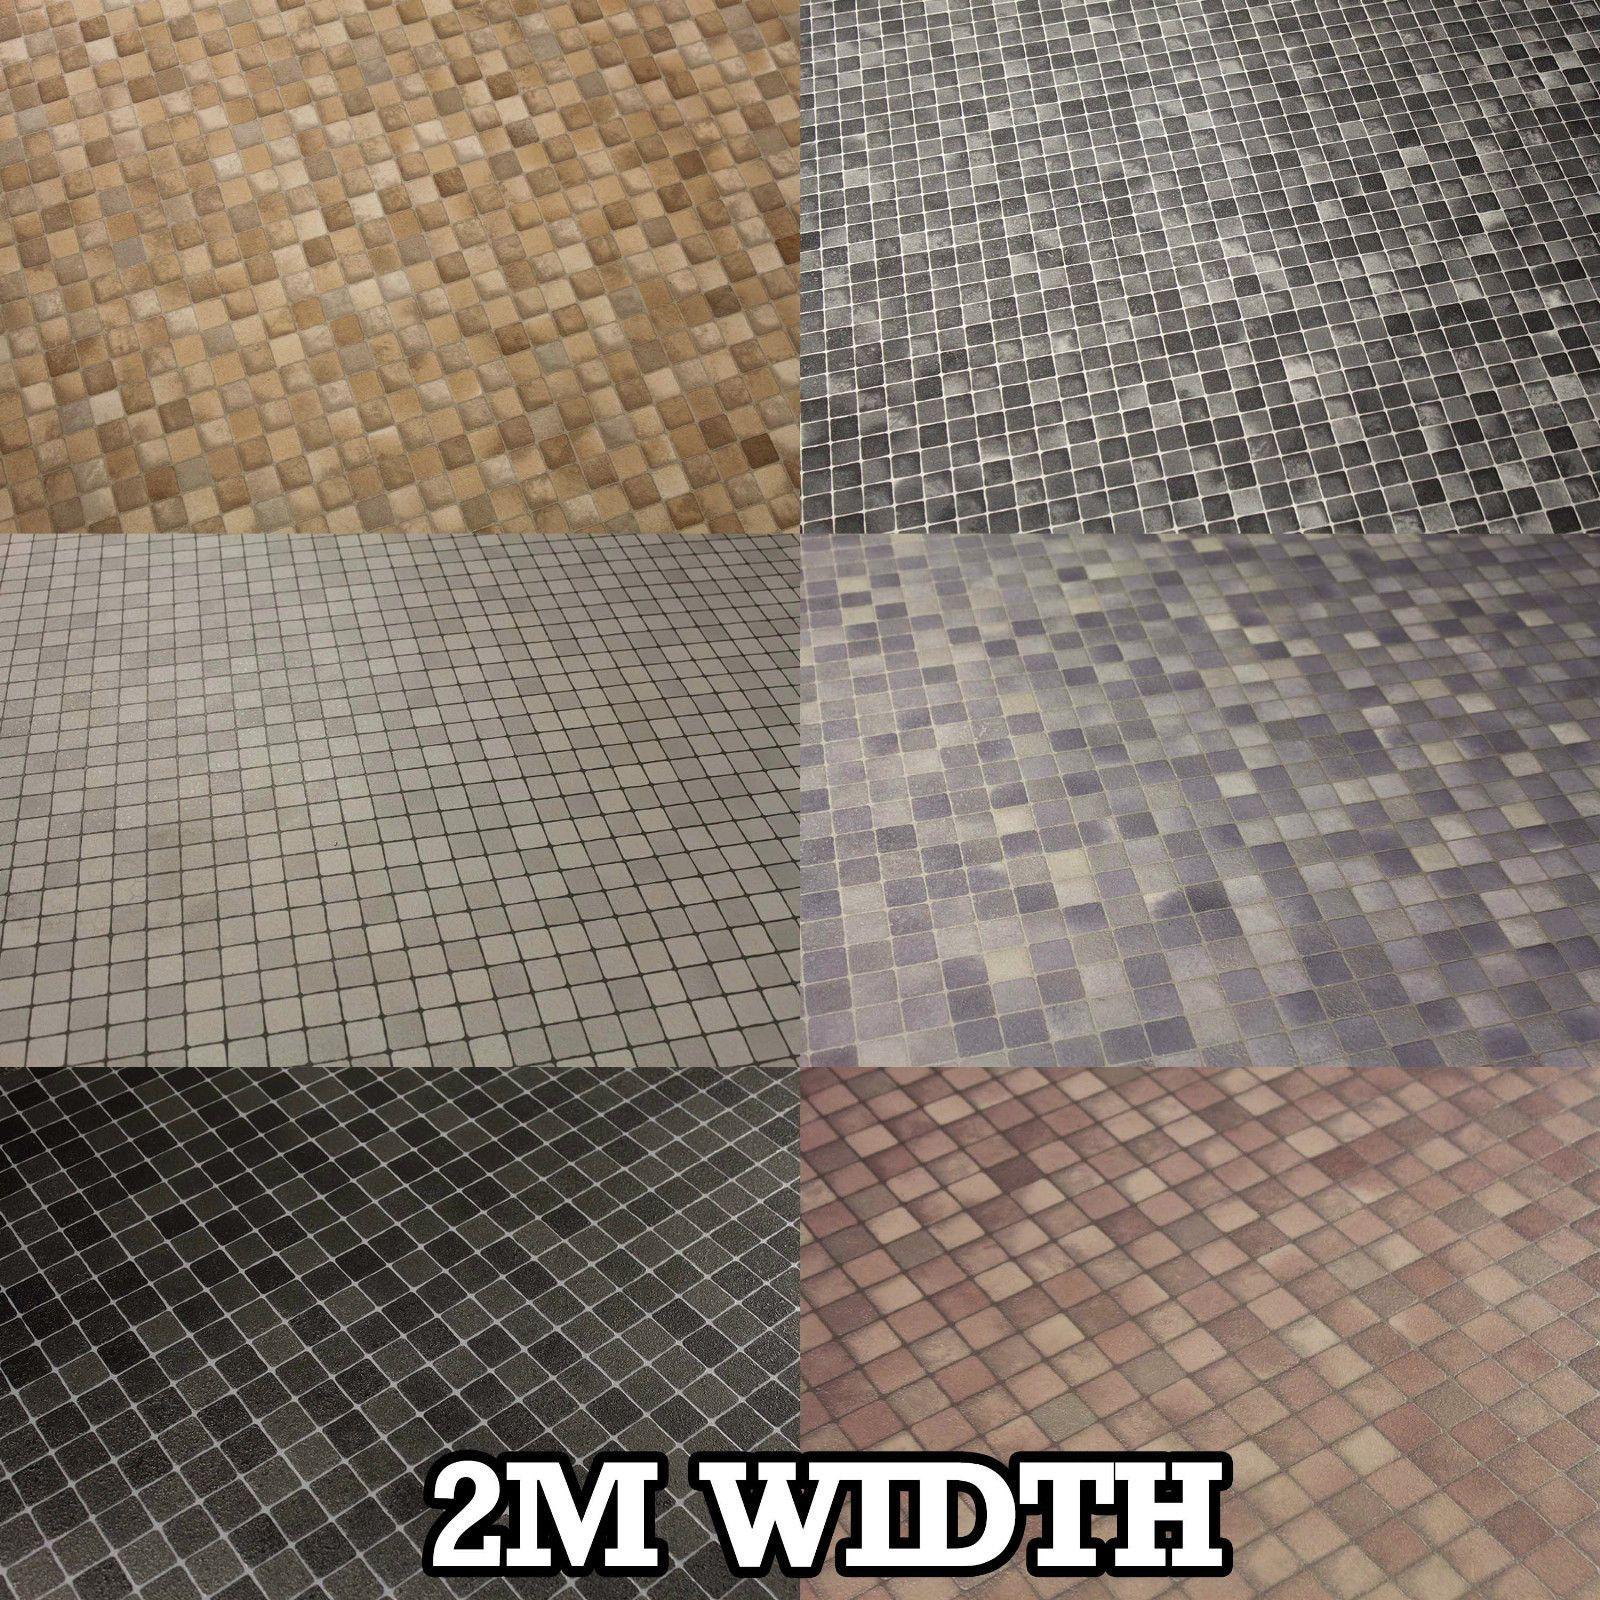 home ideas for linoleum flooring roll - Linoleum Home Ideas